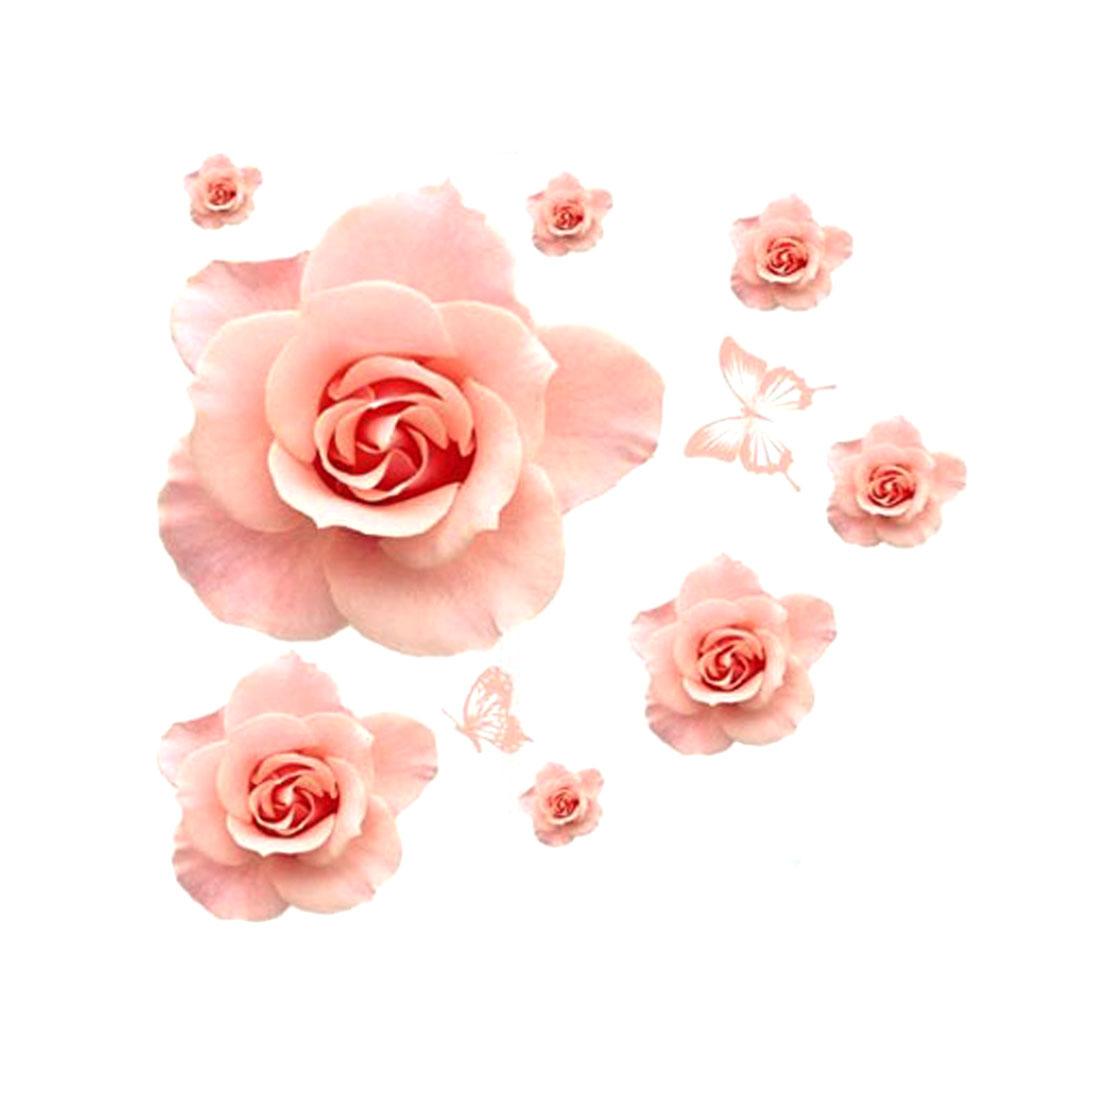 DIY Rose Flower Pattern Removable Wall Sticker Art Decal Wallpaper